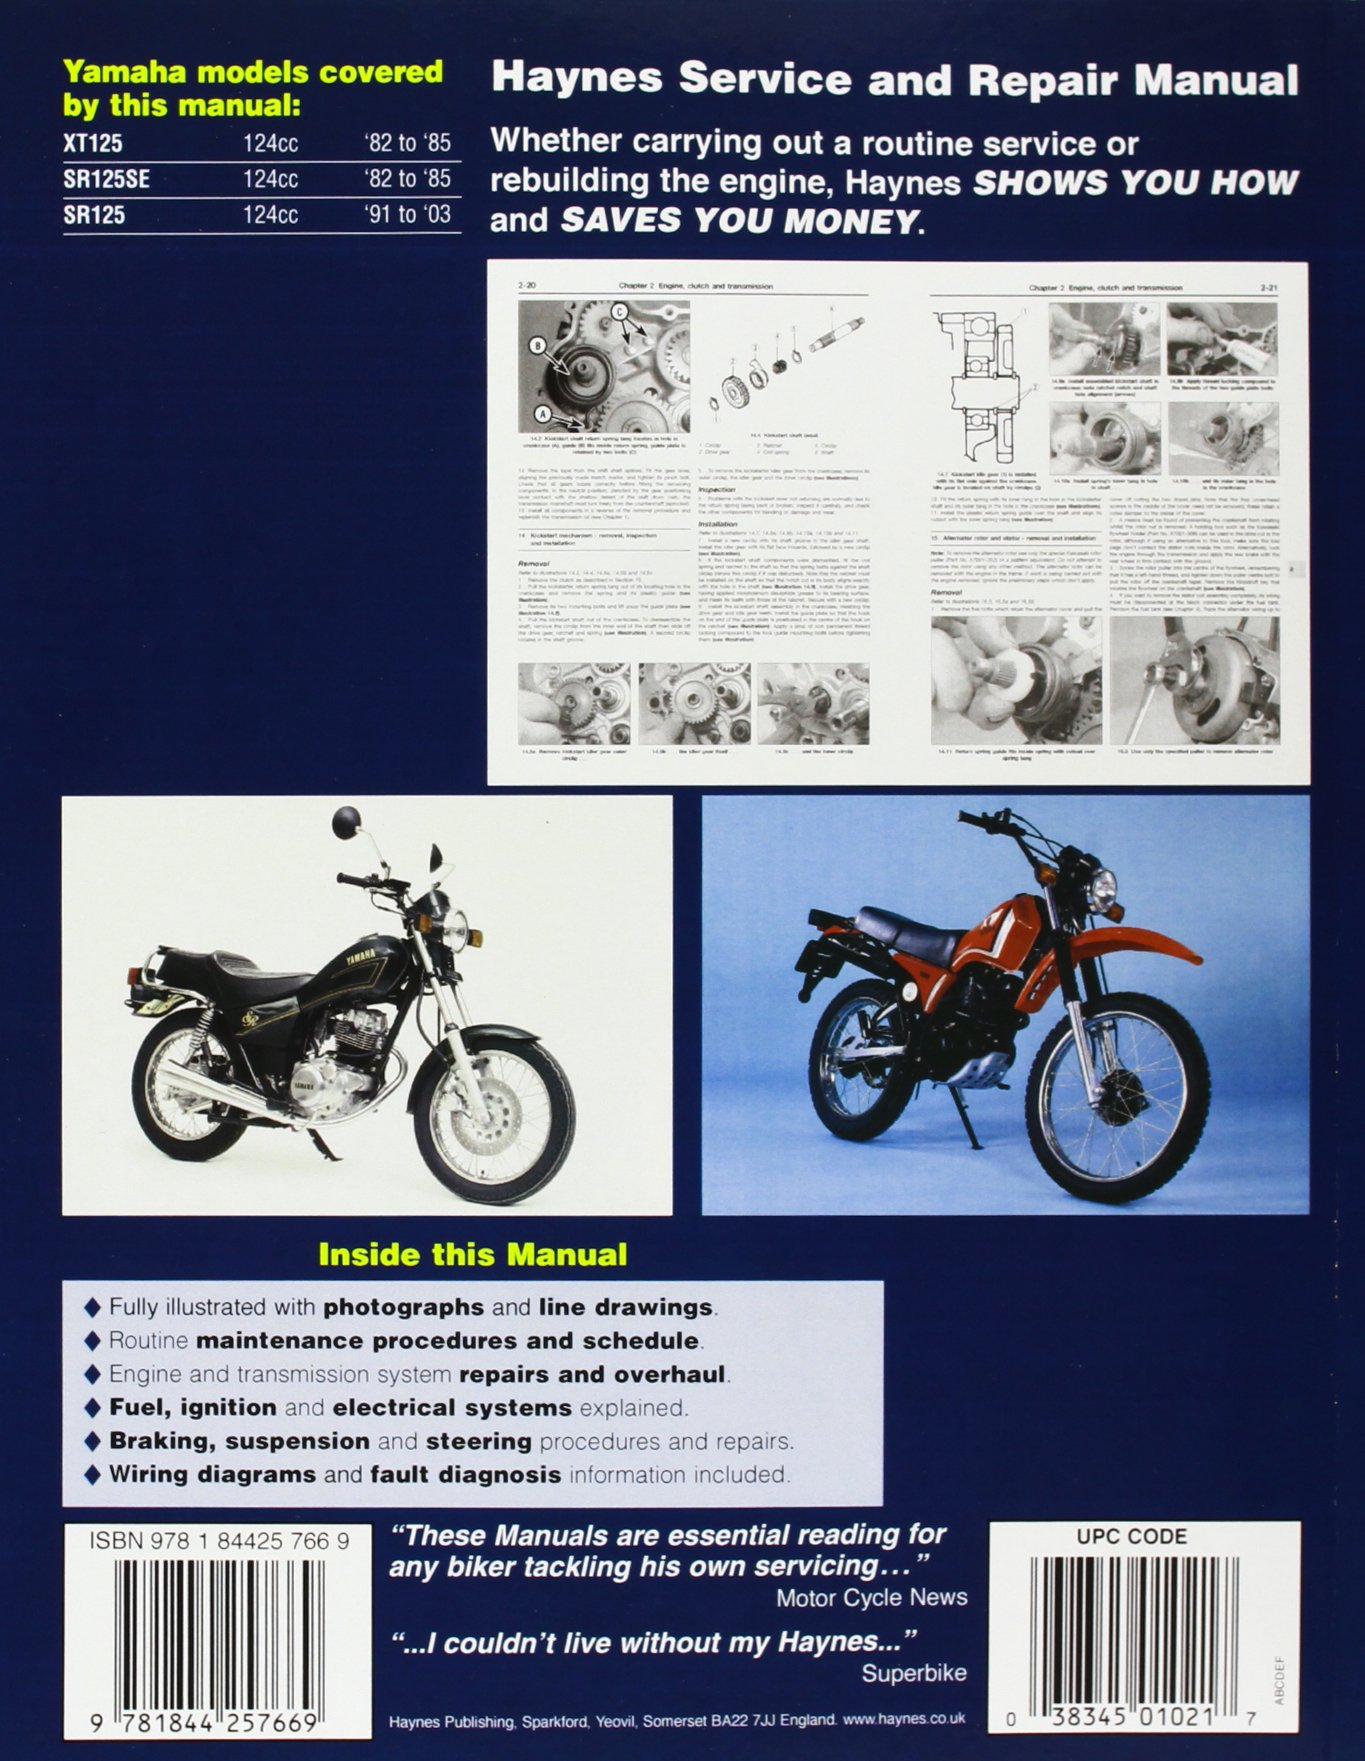 Yamaha Xt And Sr125 Singles Service Repair Manual 1982 To 2003 Reading Haynes Wiring Diagram Manuals Churchill Jeremy 9781844257669 Books